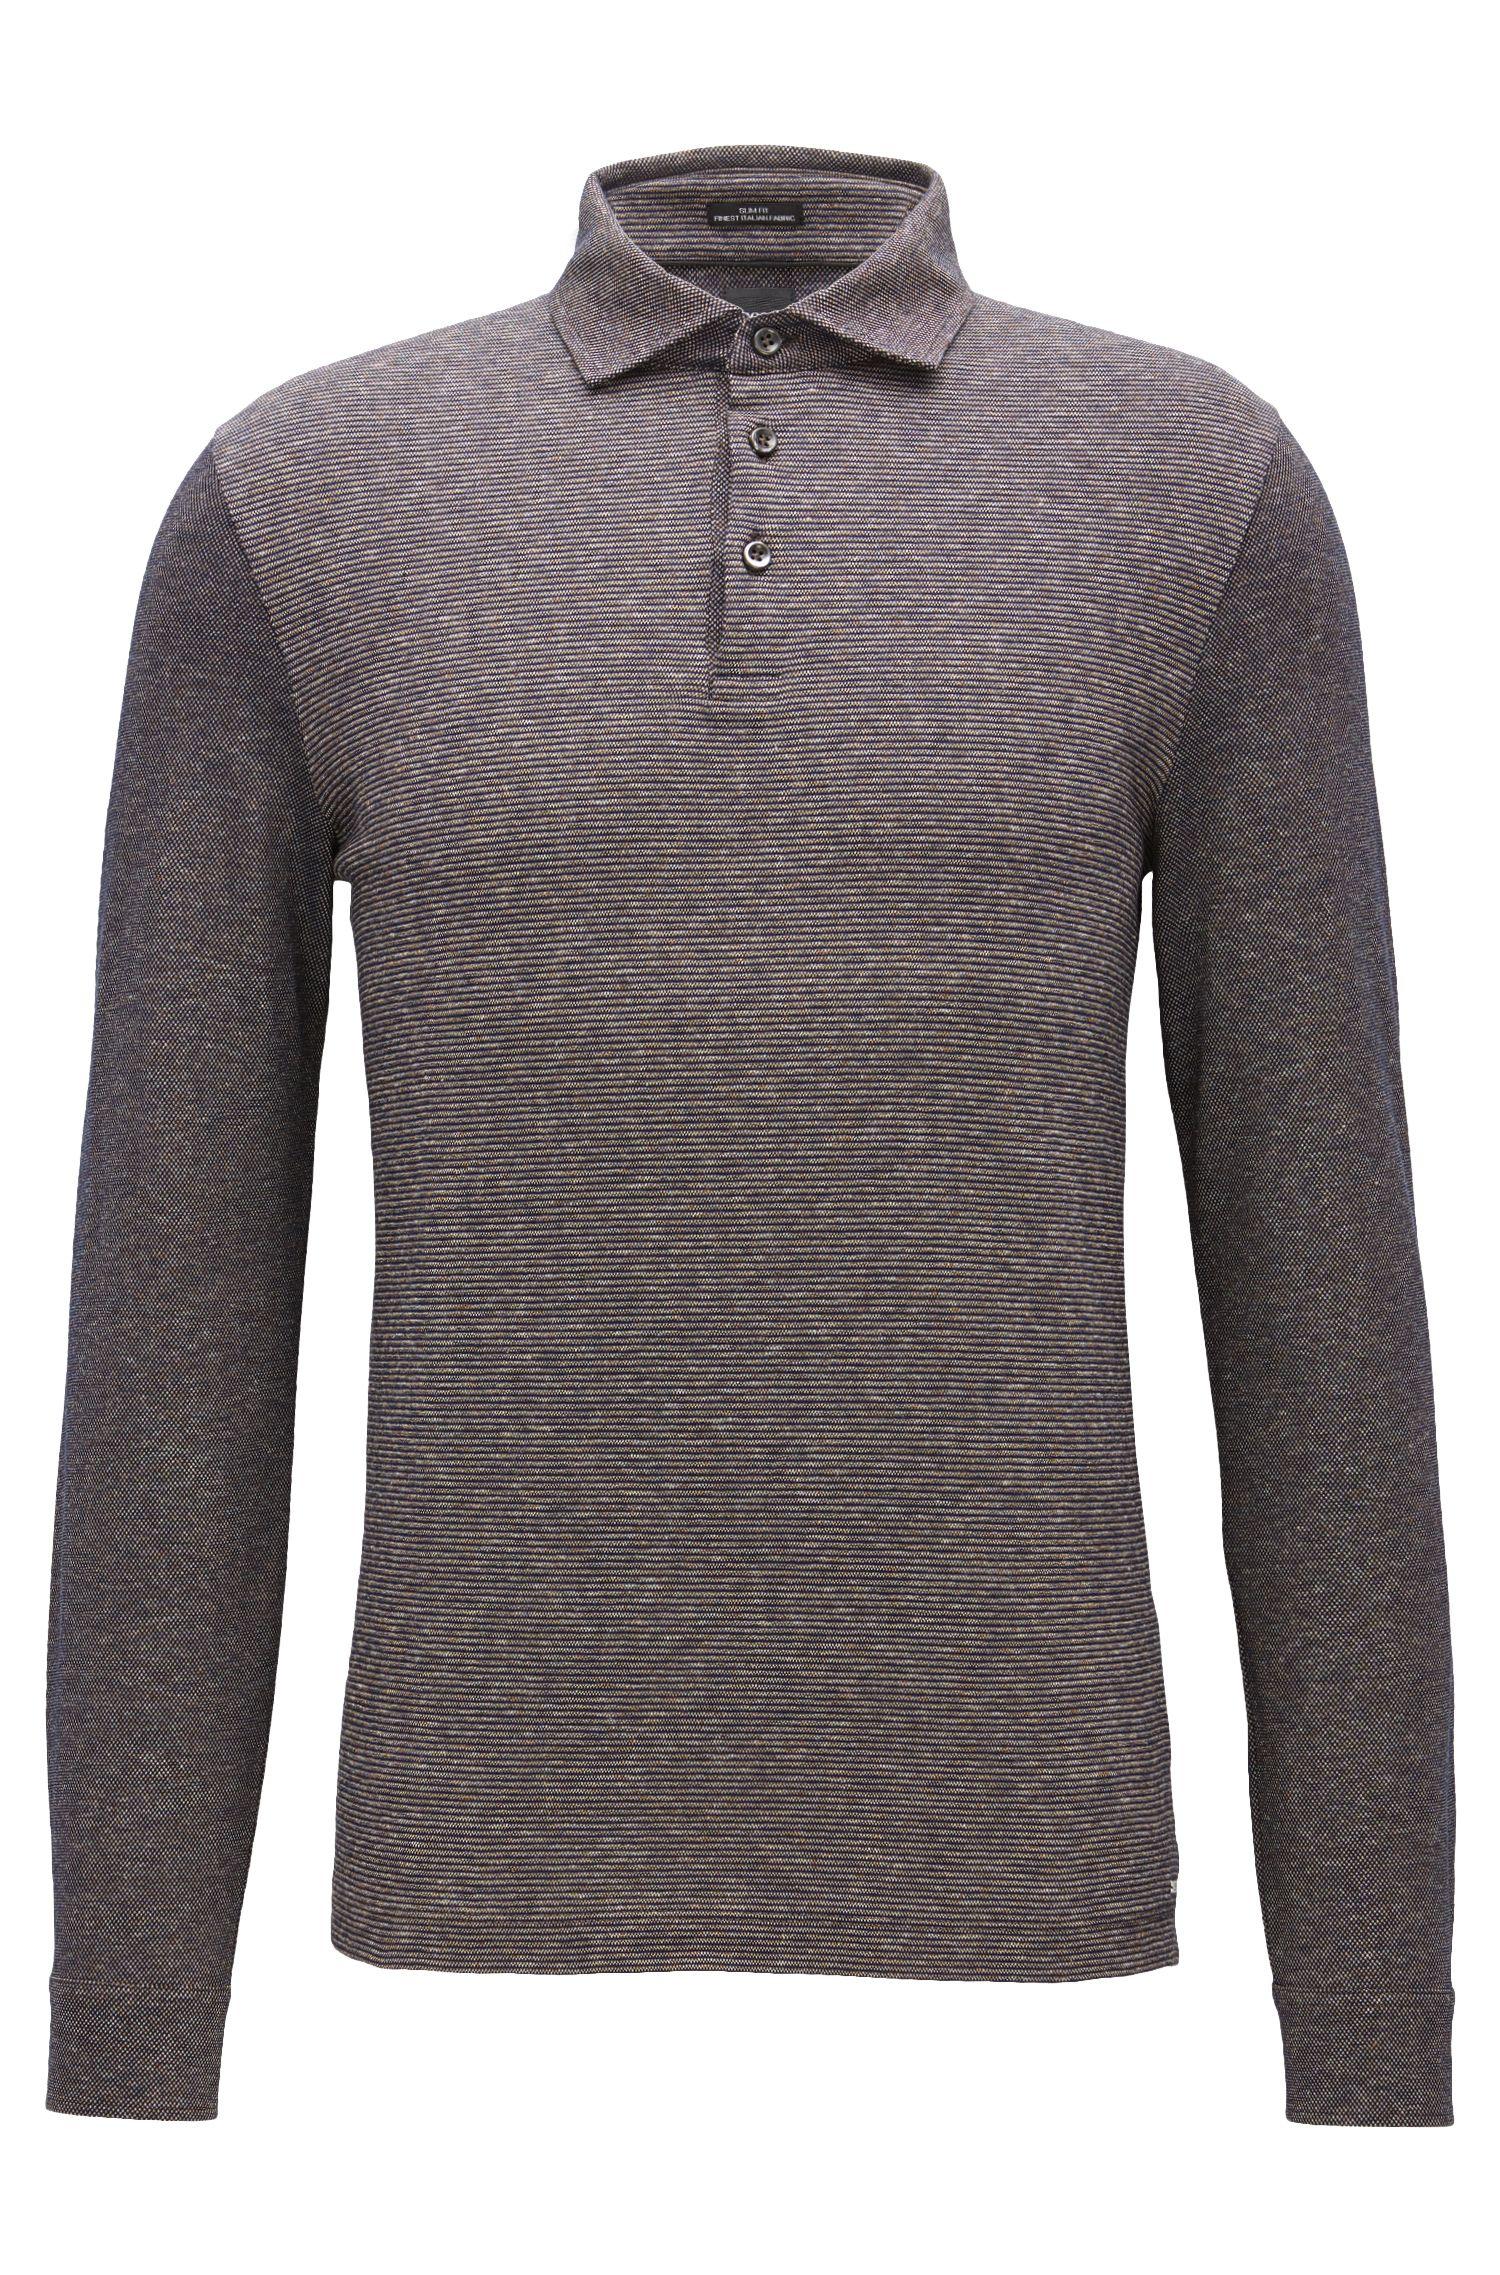 Italian Cotton Polo Shirt, Slim Fit | T-Morrison, Brown